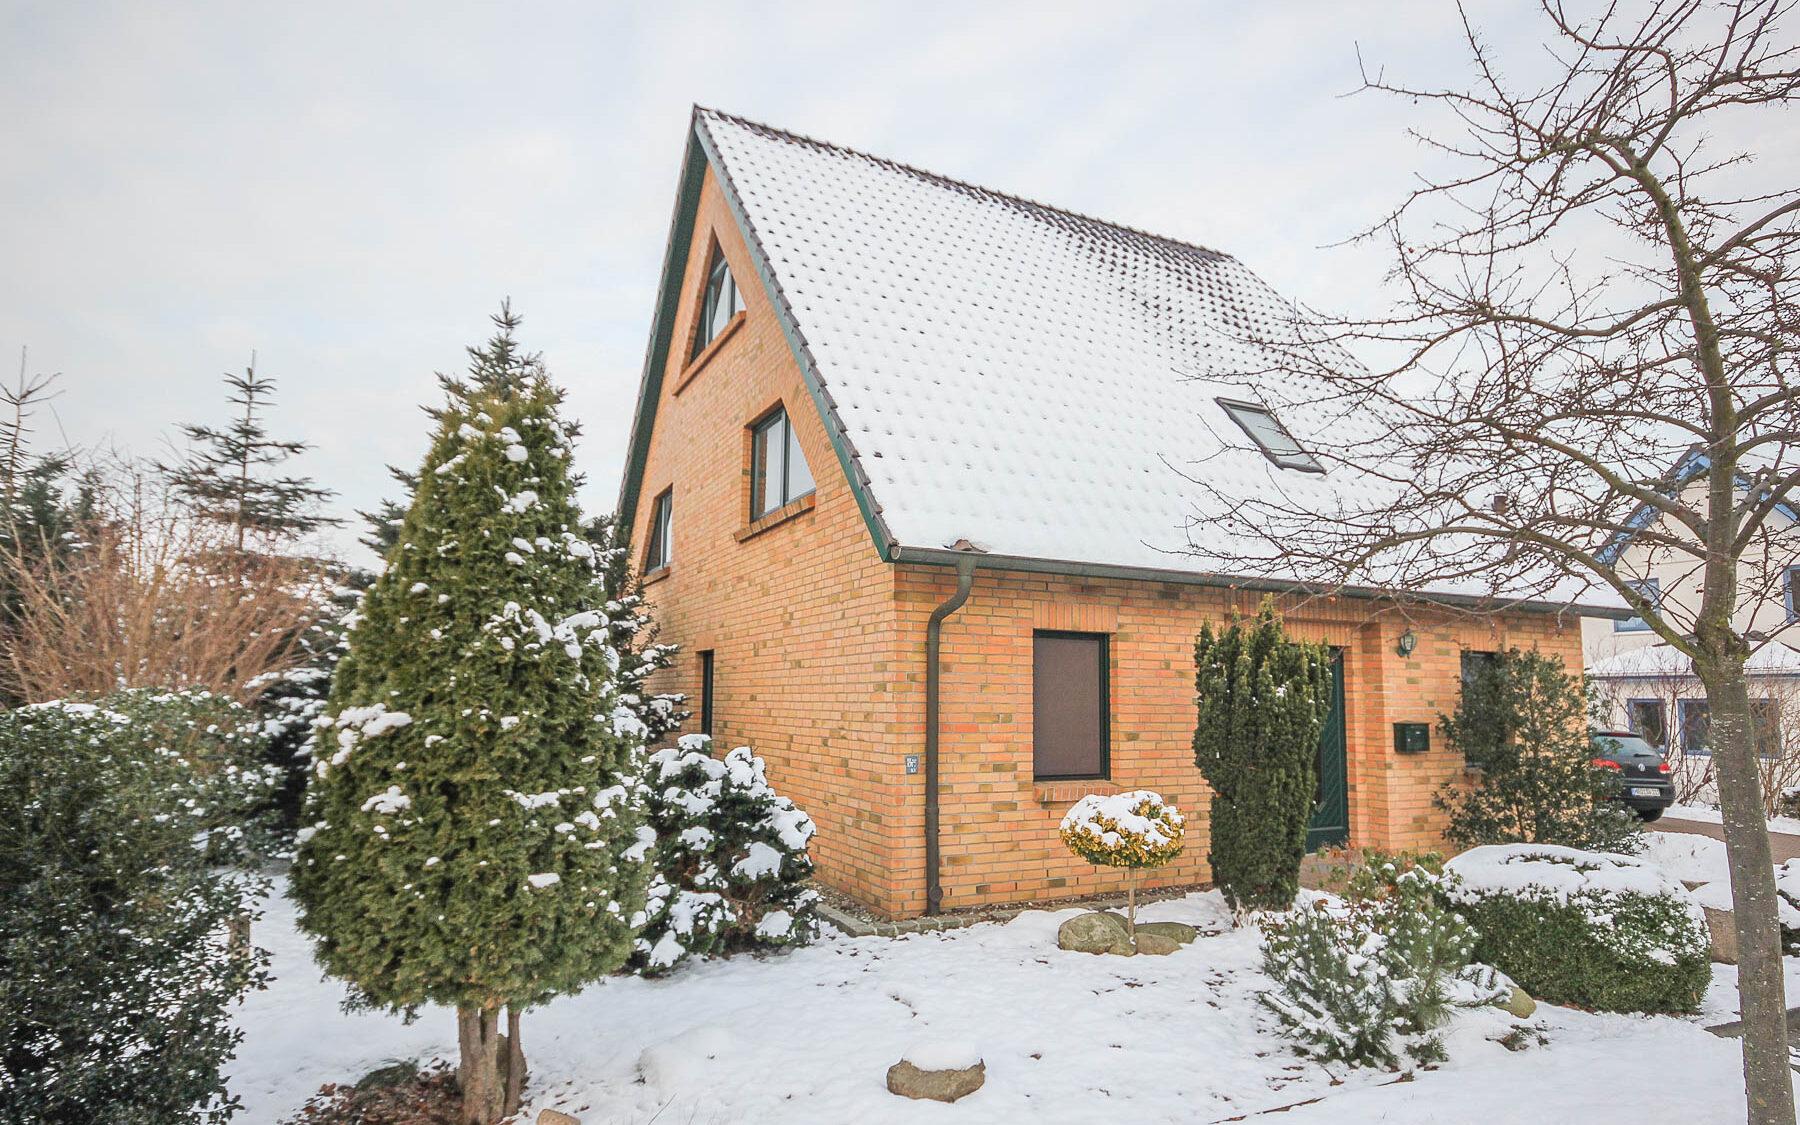 Wohnhaus-Rostock-Riekdahl